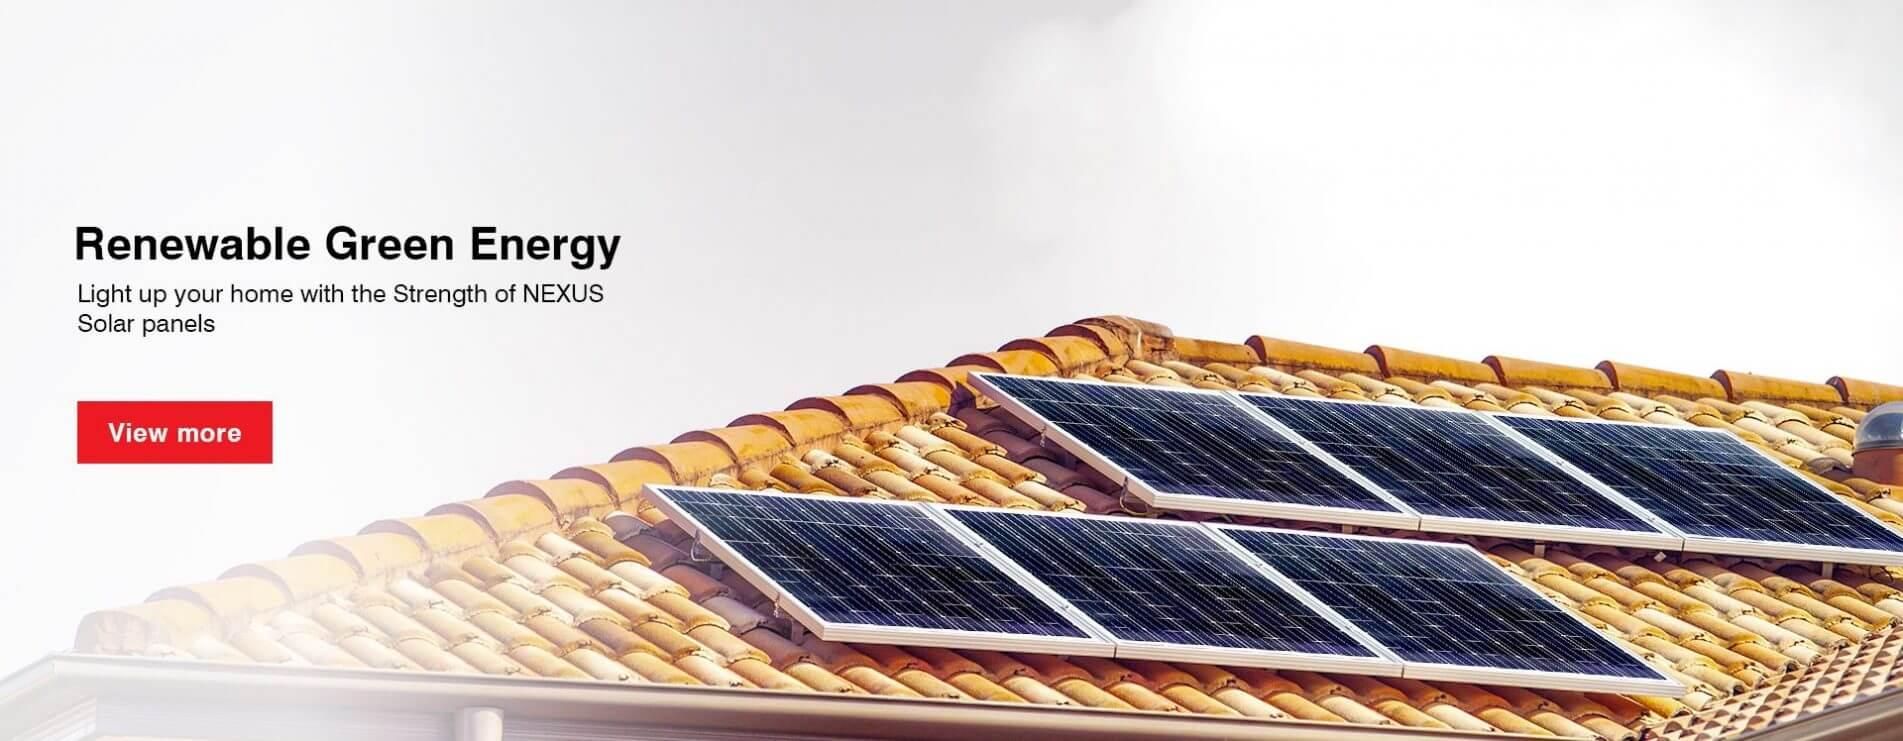 solar-panel-s